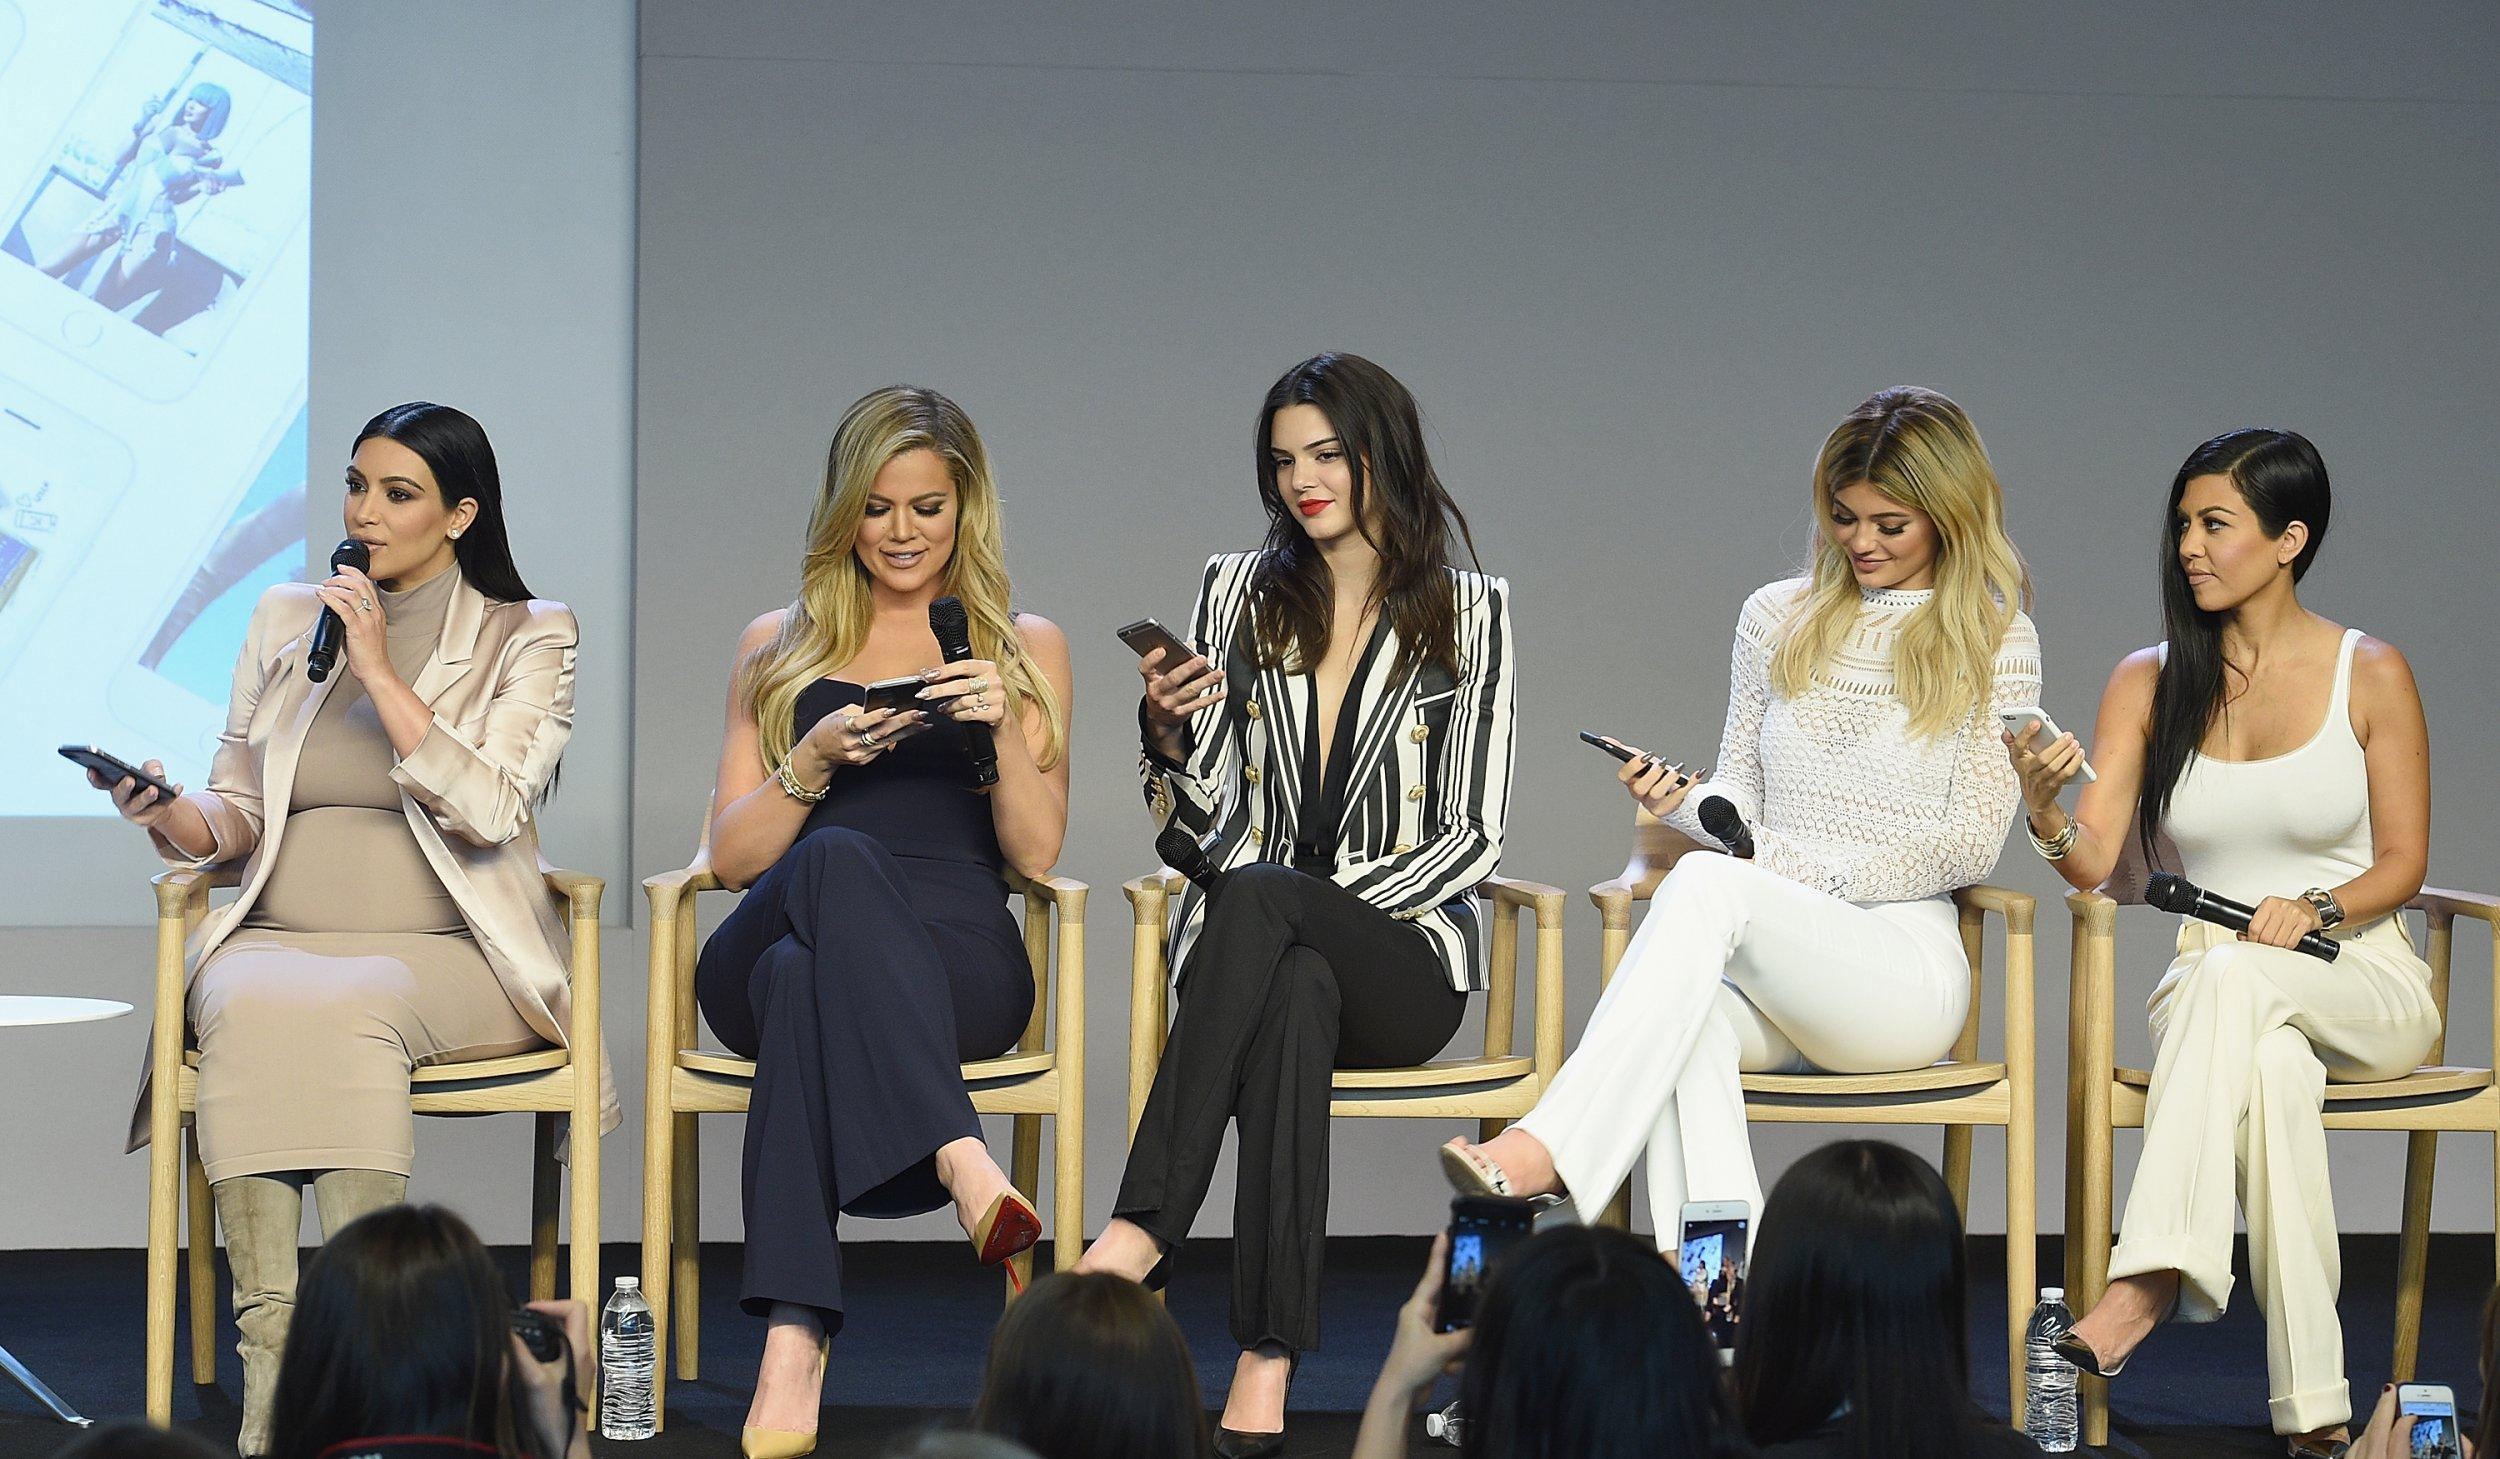 Kim, Khloe, Kourtney, Kylie and Kendall